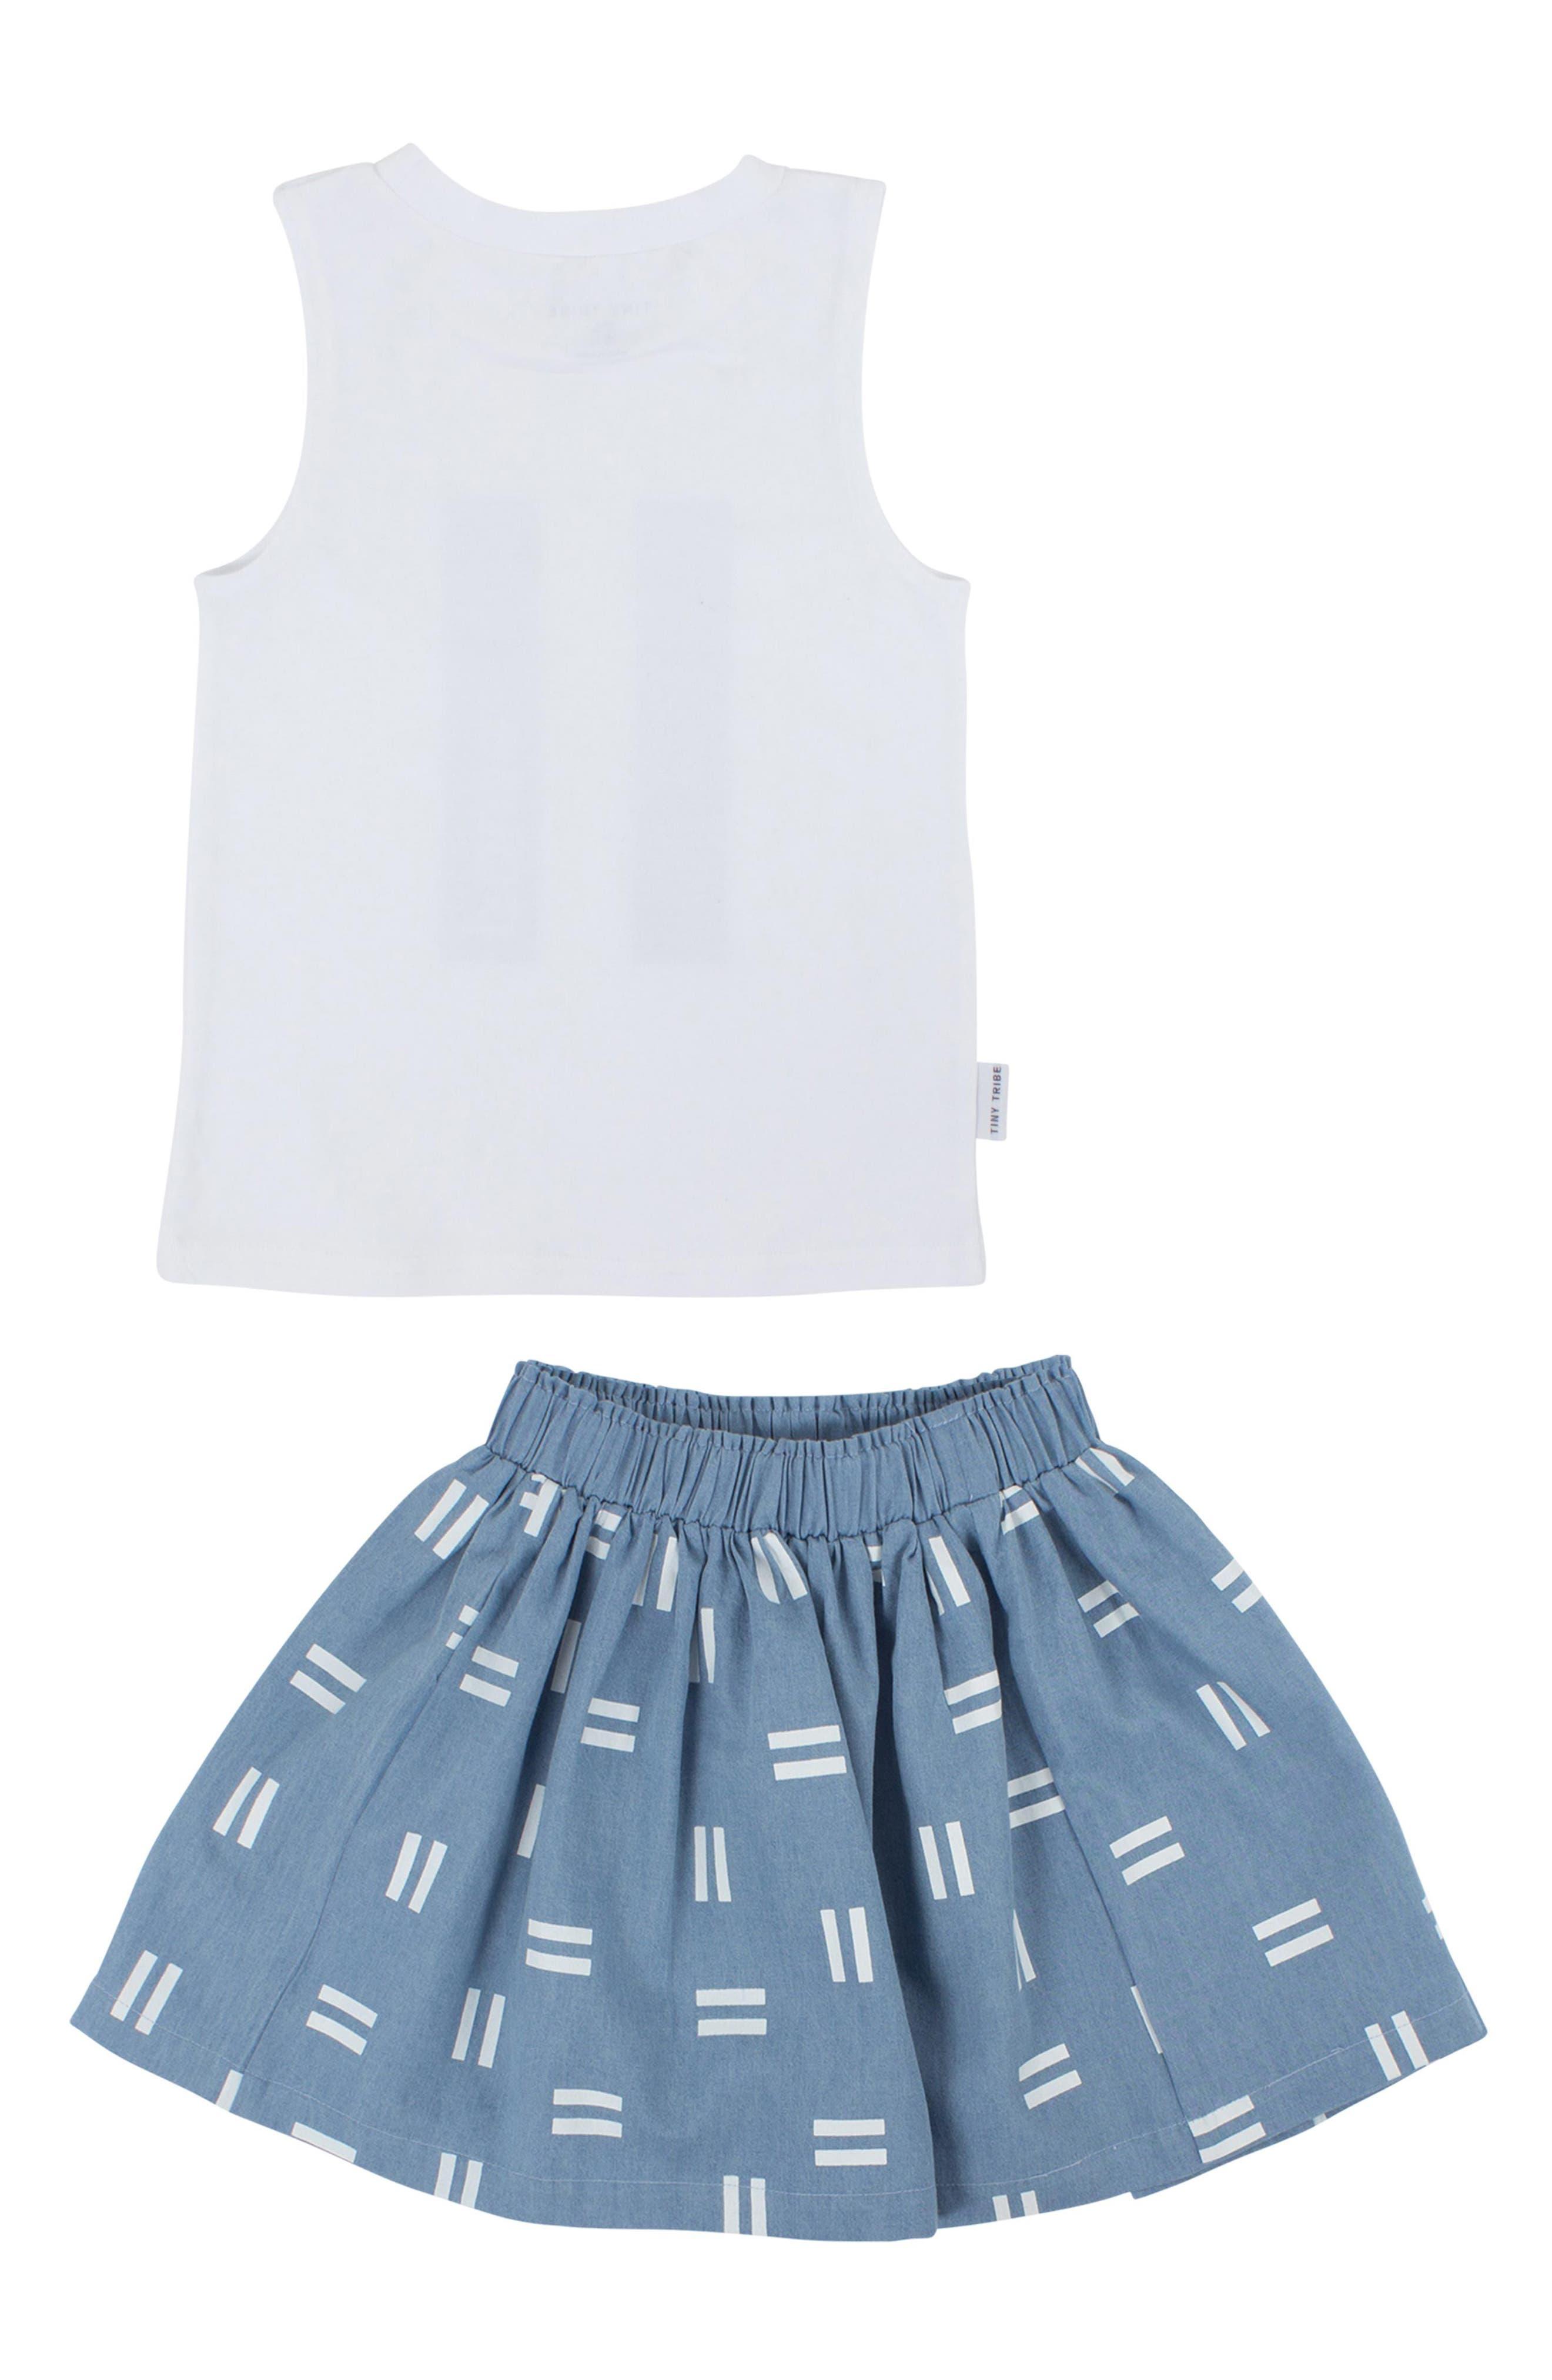 Pause Tank & Chambray Skirt Set,                             Alternate thumbnail 2, color,                             White/ Chambray